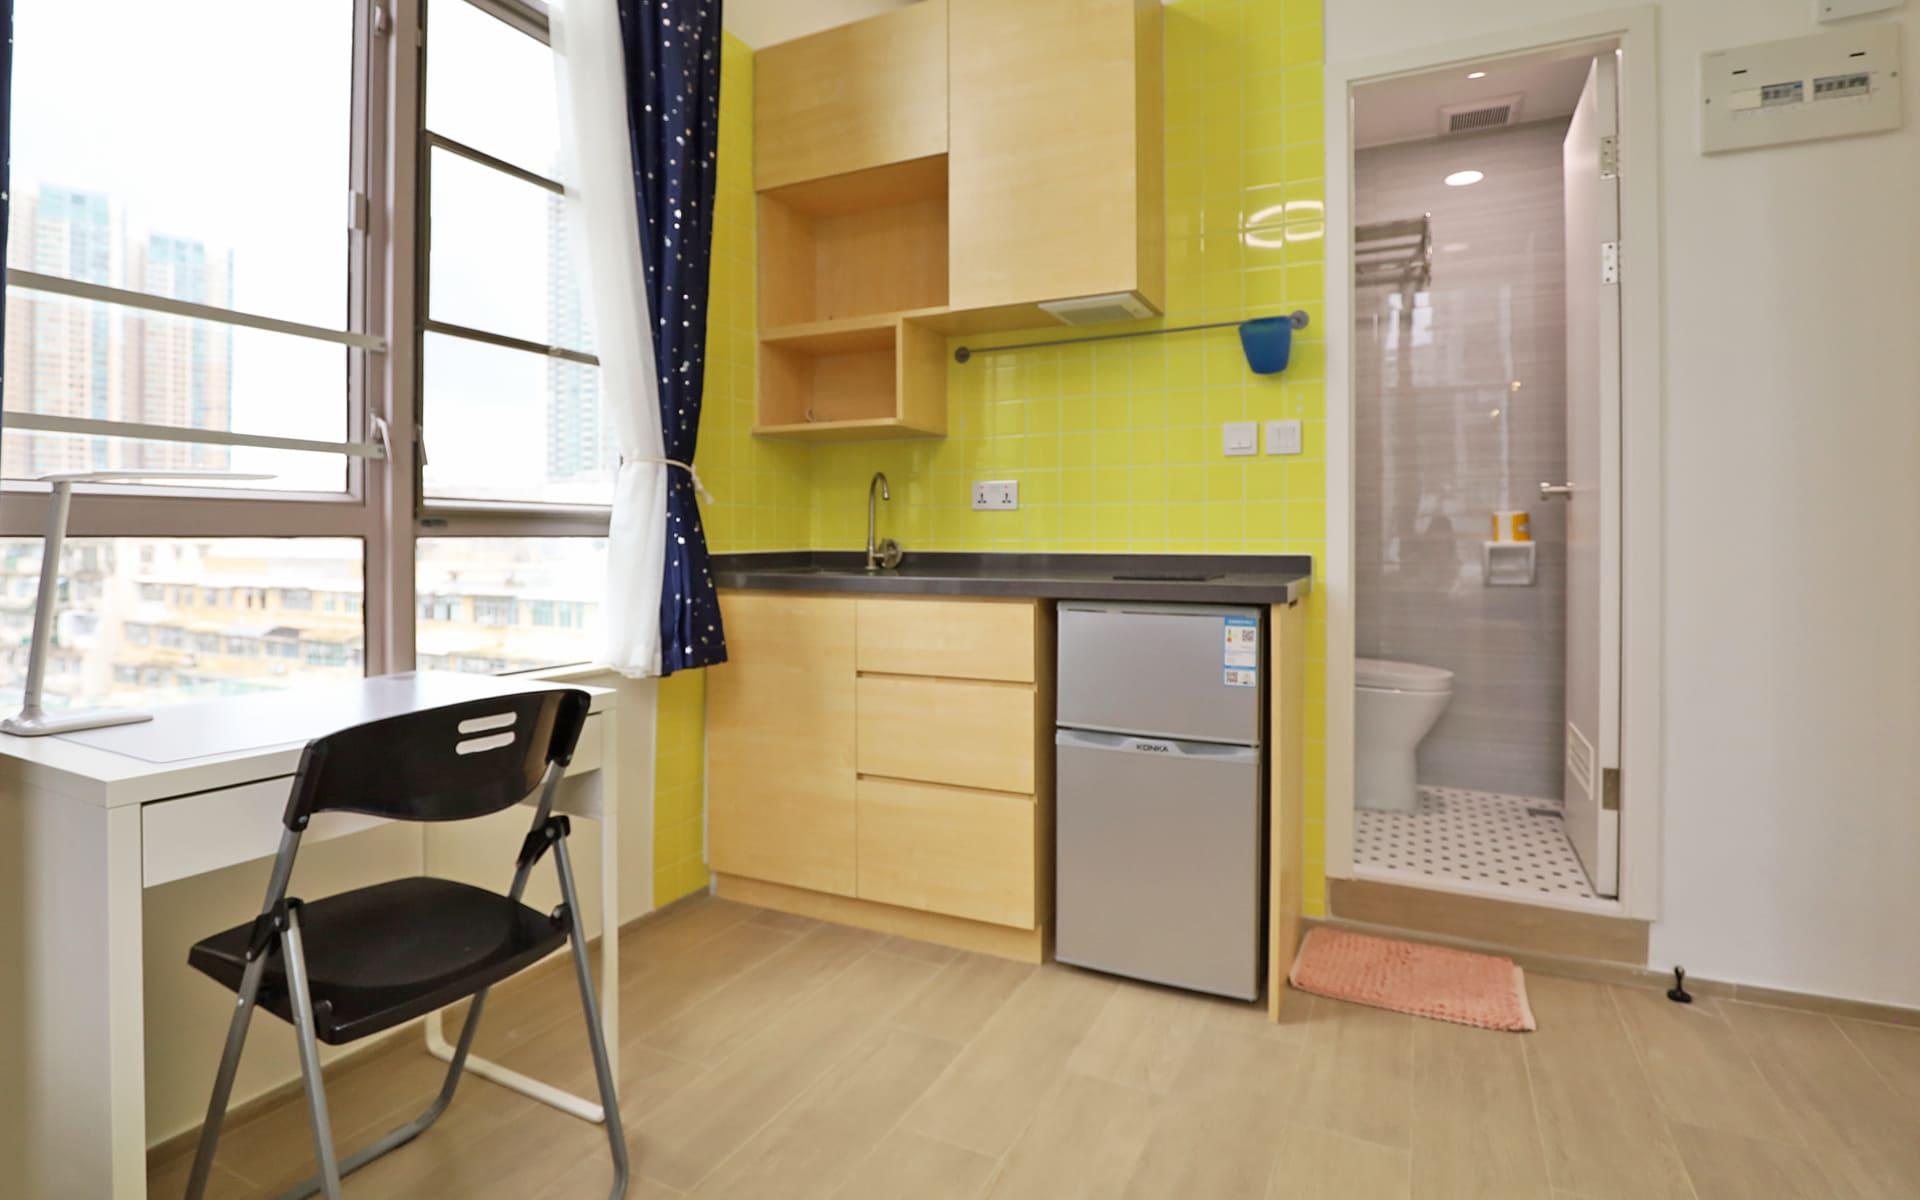 hk_service_apartment_4274284831596691912.jpg